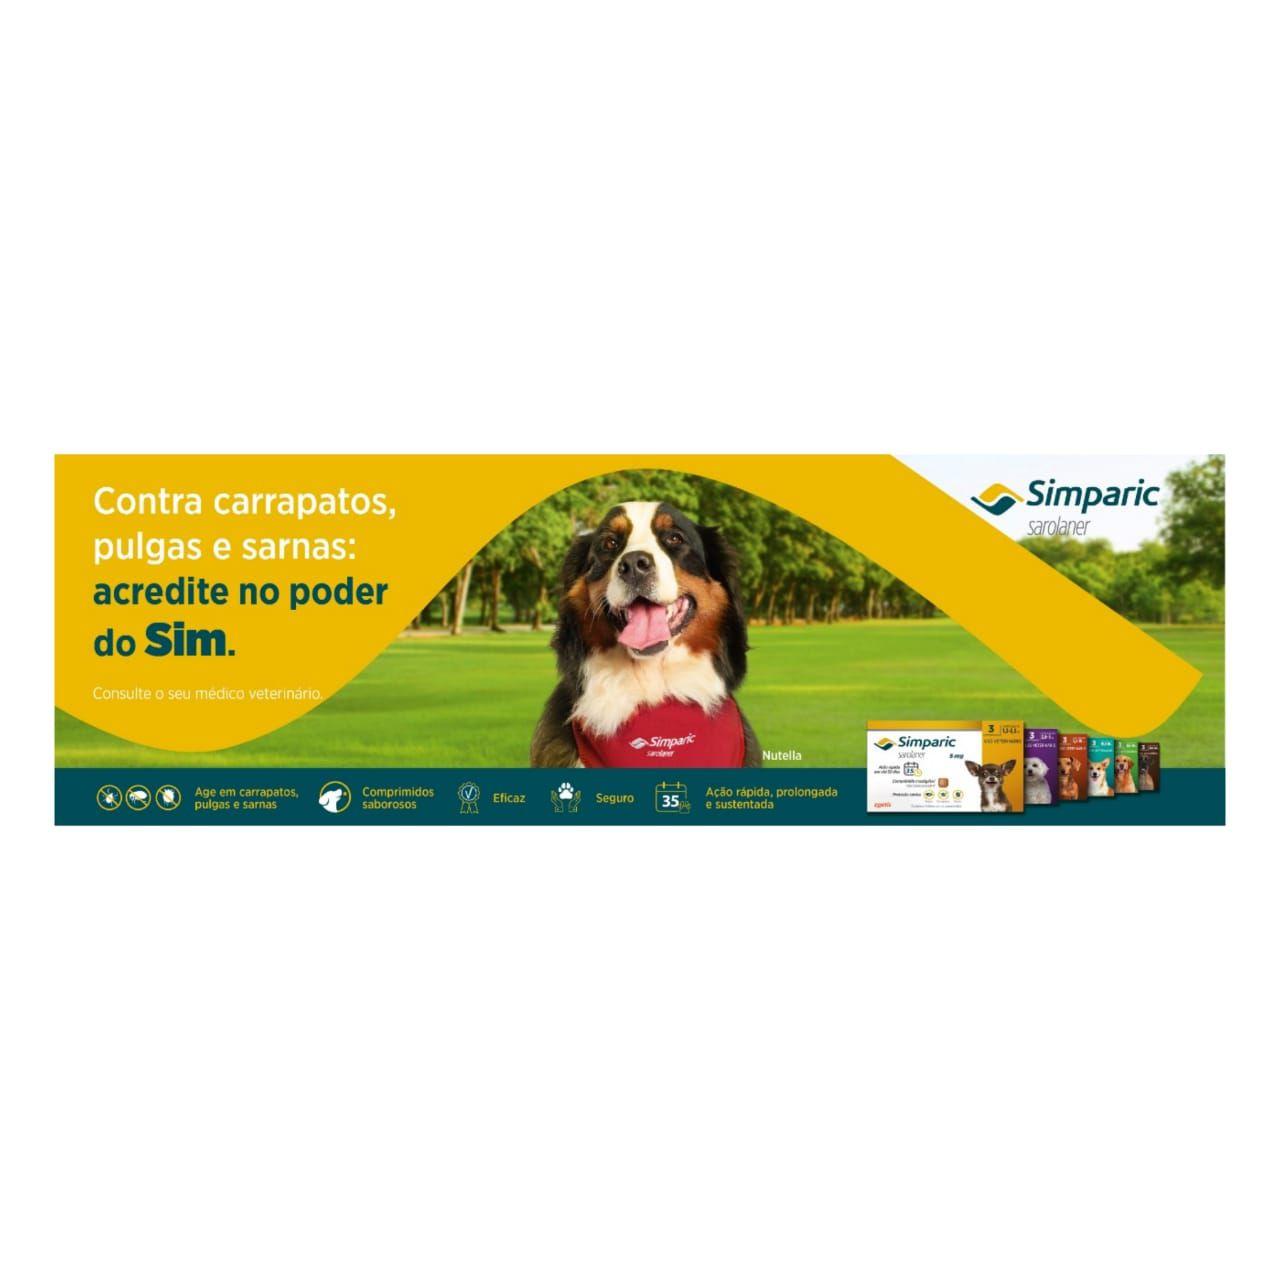 Antipulgas Zoetis Simparic   5mg para Cães 1,3 a 2,5 Kg - 3 Comprimidos